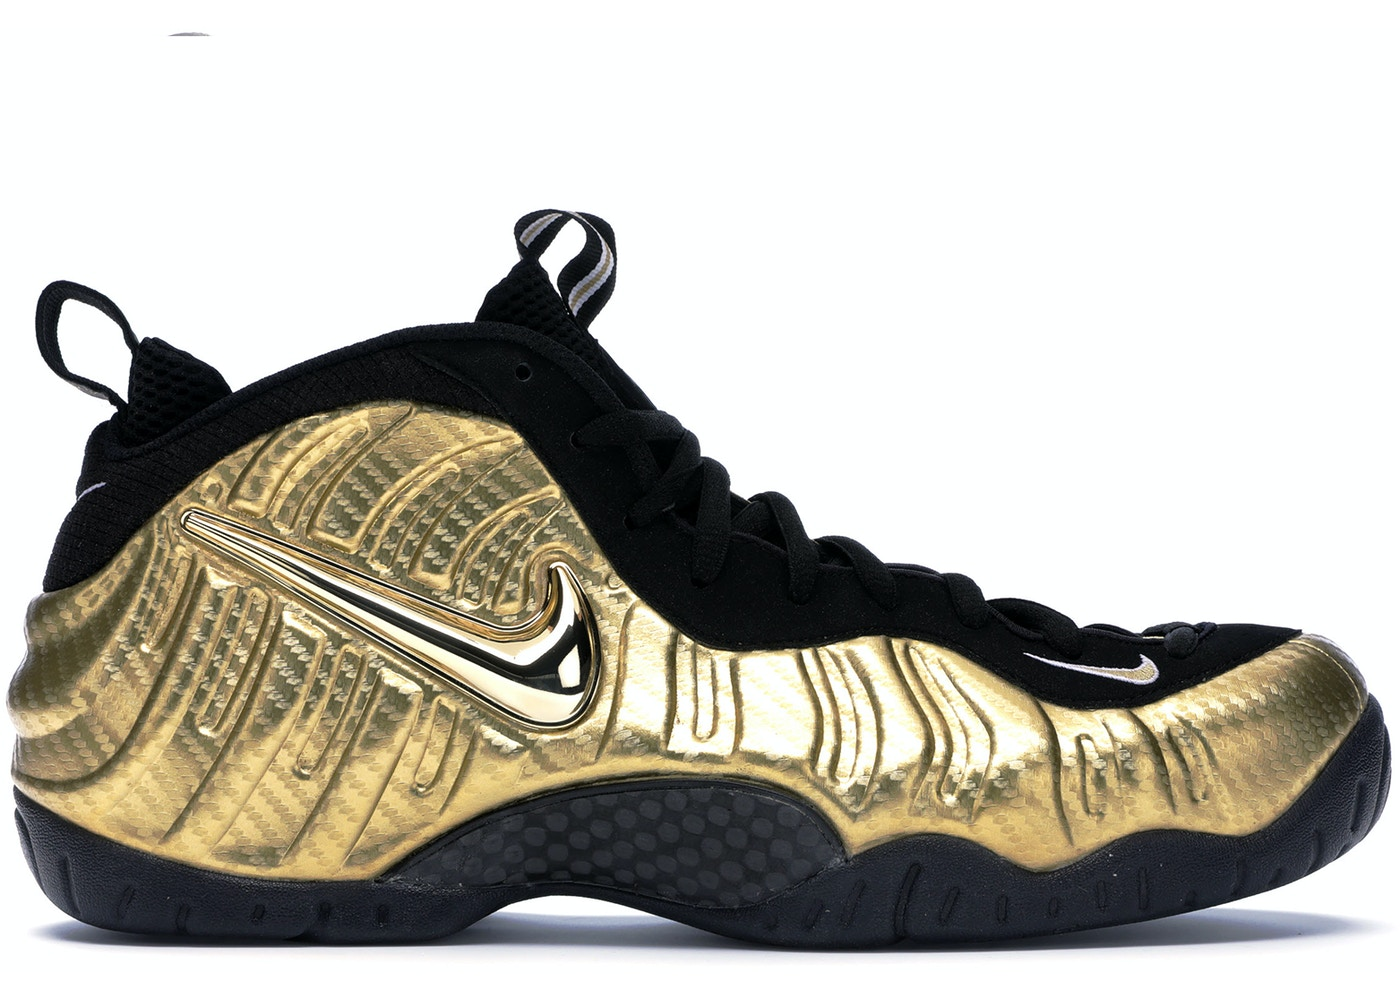 premium selection df951 95e79 Air Nike Foamposite Pro Metallic Gold